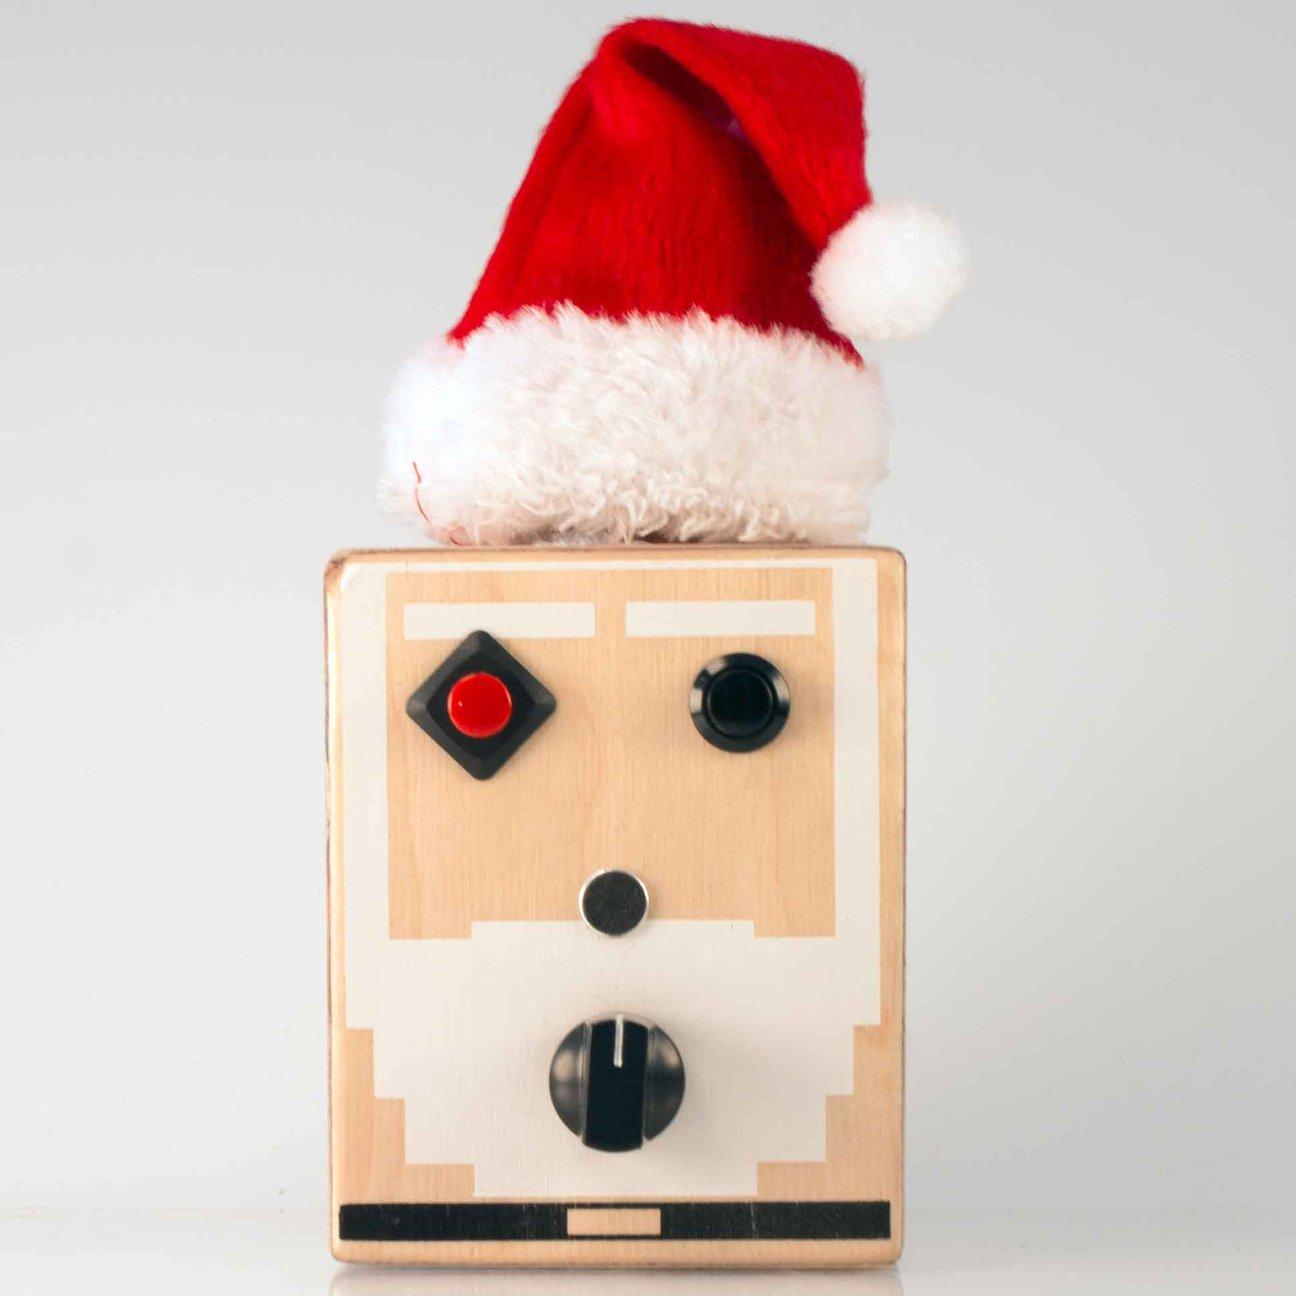 Handmade toys for kids: 8-bit Santa handmade wooden sound machine by Brand New Noise